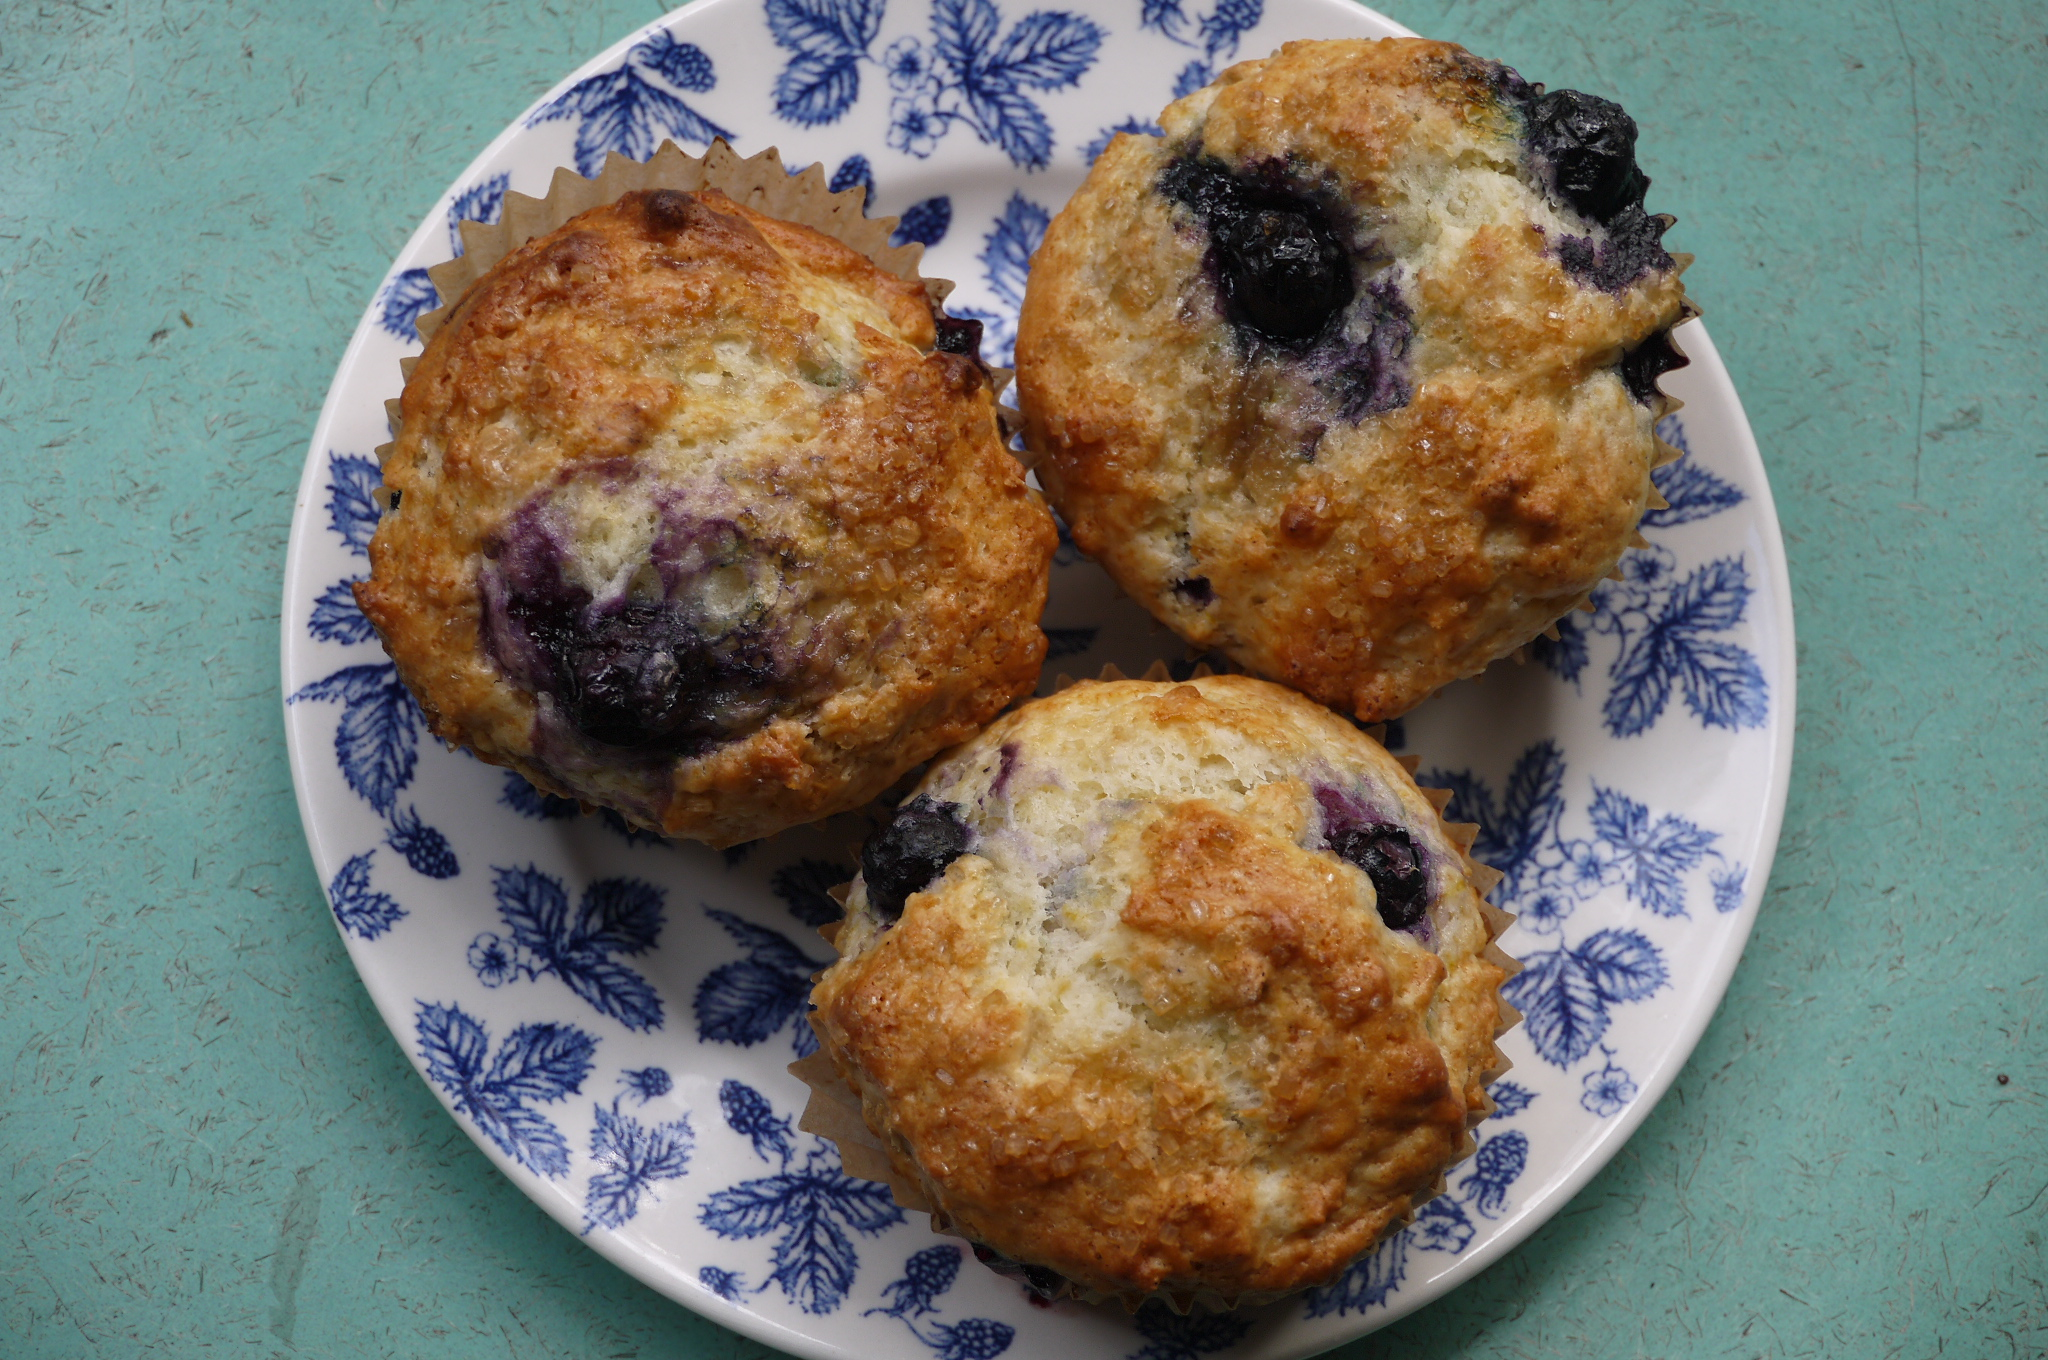 blueberry muffins - trustinkim.com